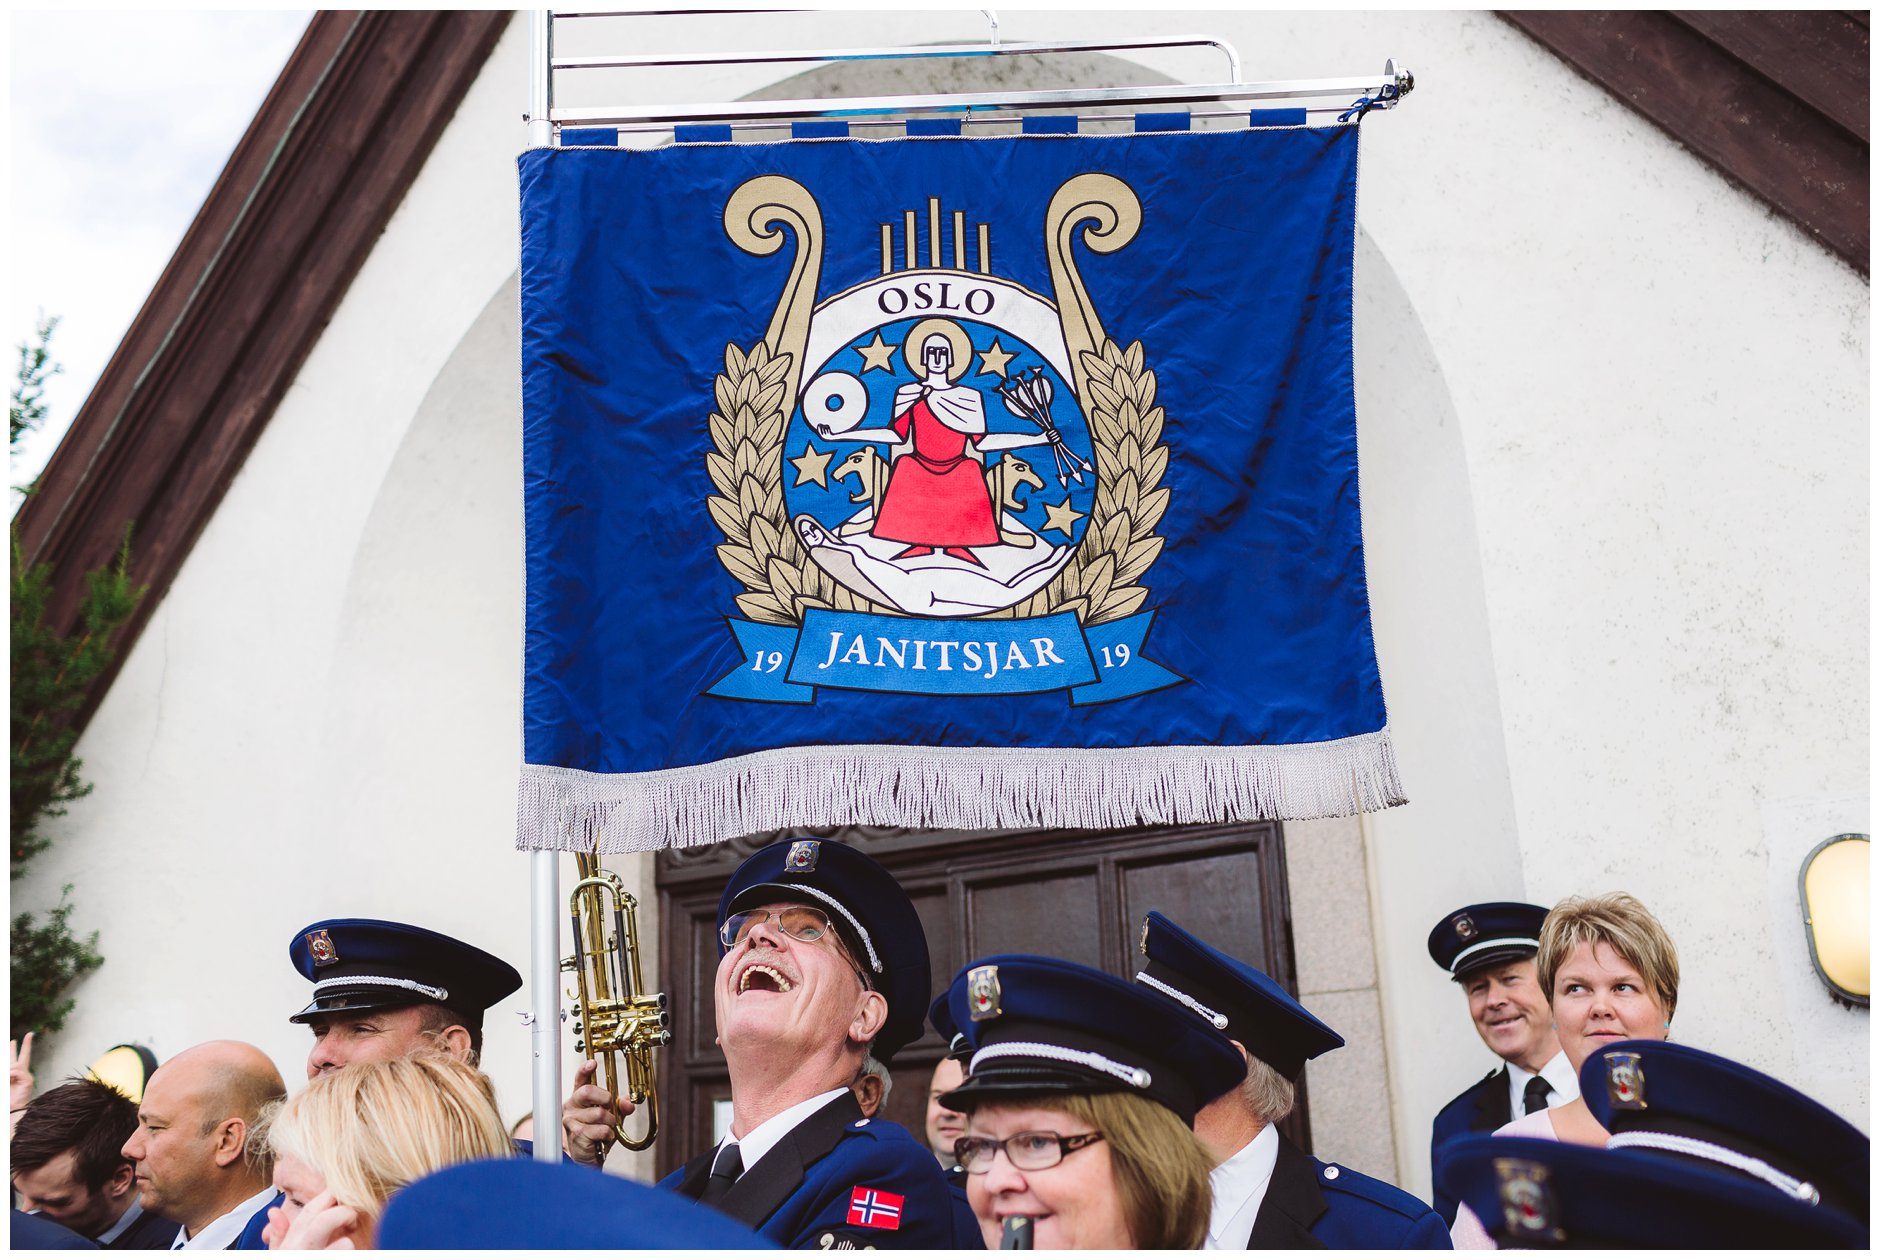 Oslo Janitsjar